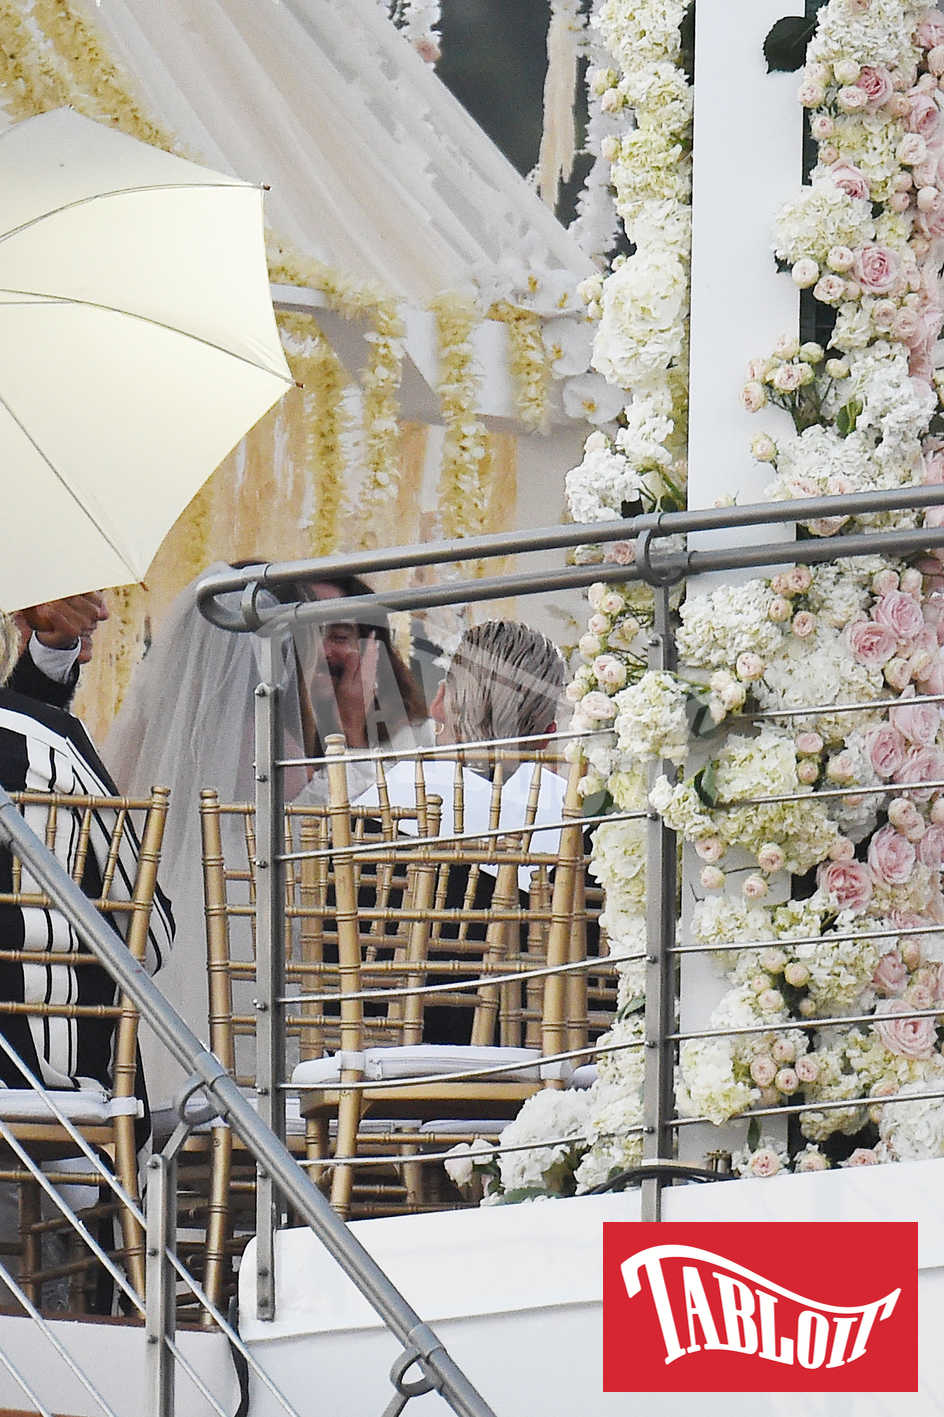 Heidi Klum e Tom Kaulitz si baciano durante la cerimonia